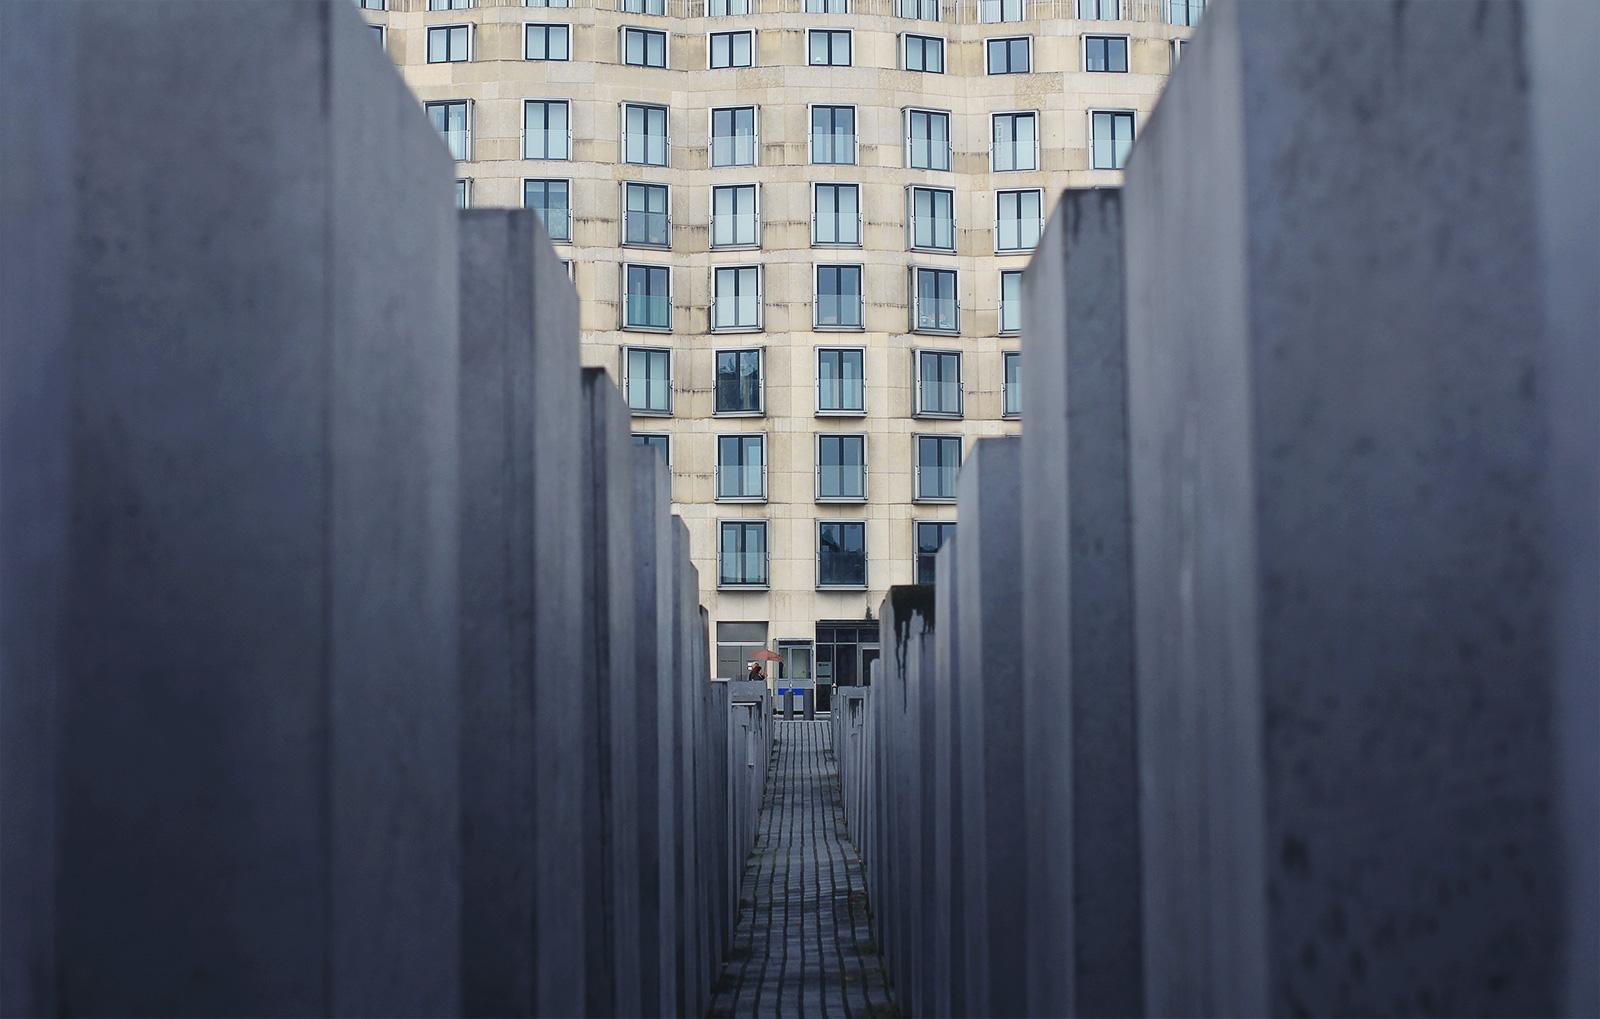 berlin-15okt-07